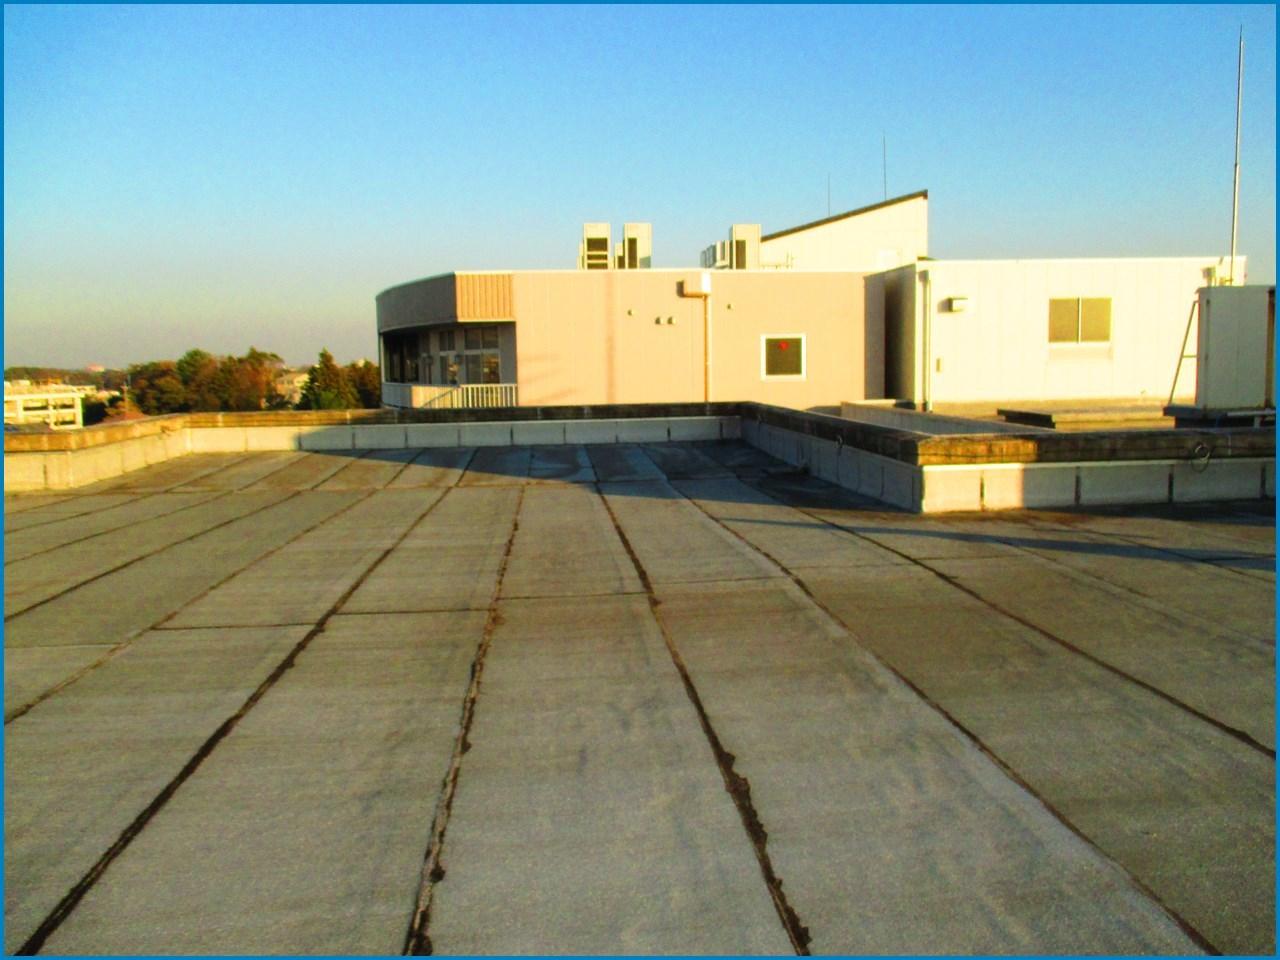 N病院グループ 特定建築物の定期報告調査1_c0376508_17481386.jpg